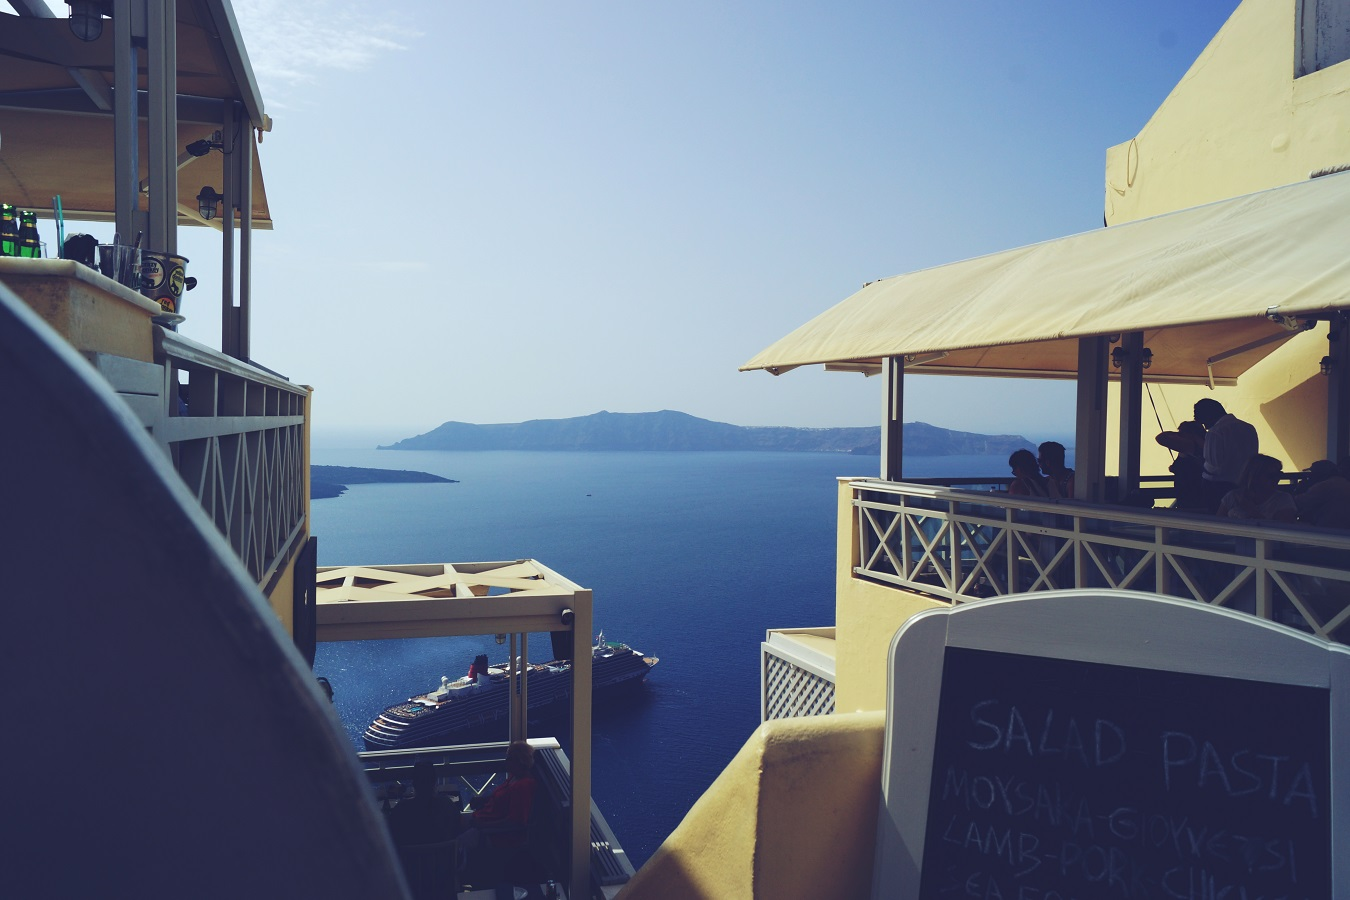 santorinin queen victoria port cruise